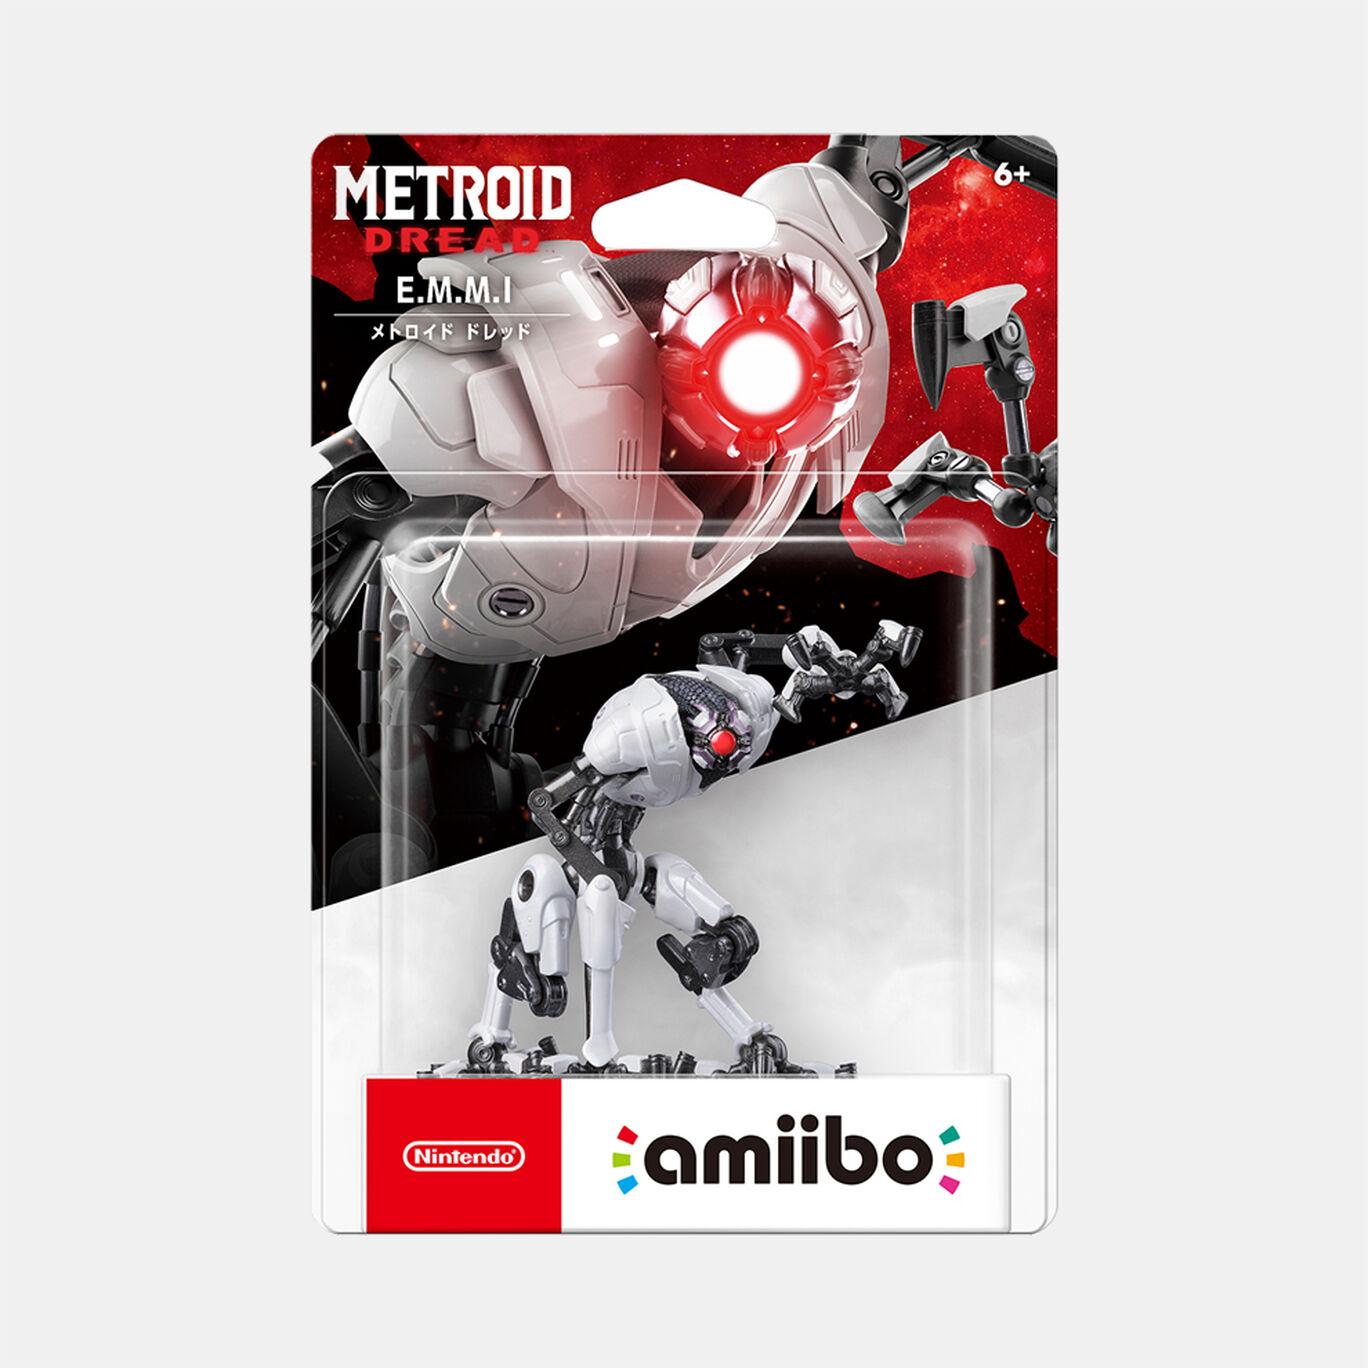 amiibo E.M.M.I.【メトロイド ドレッド】(メトロイドシリーズ)